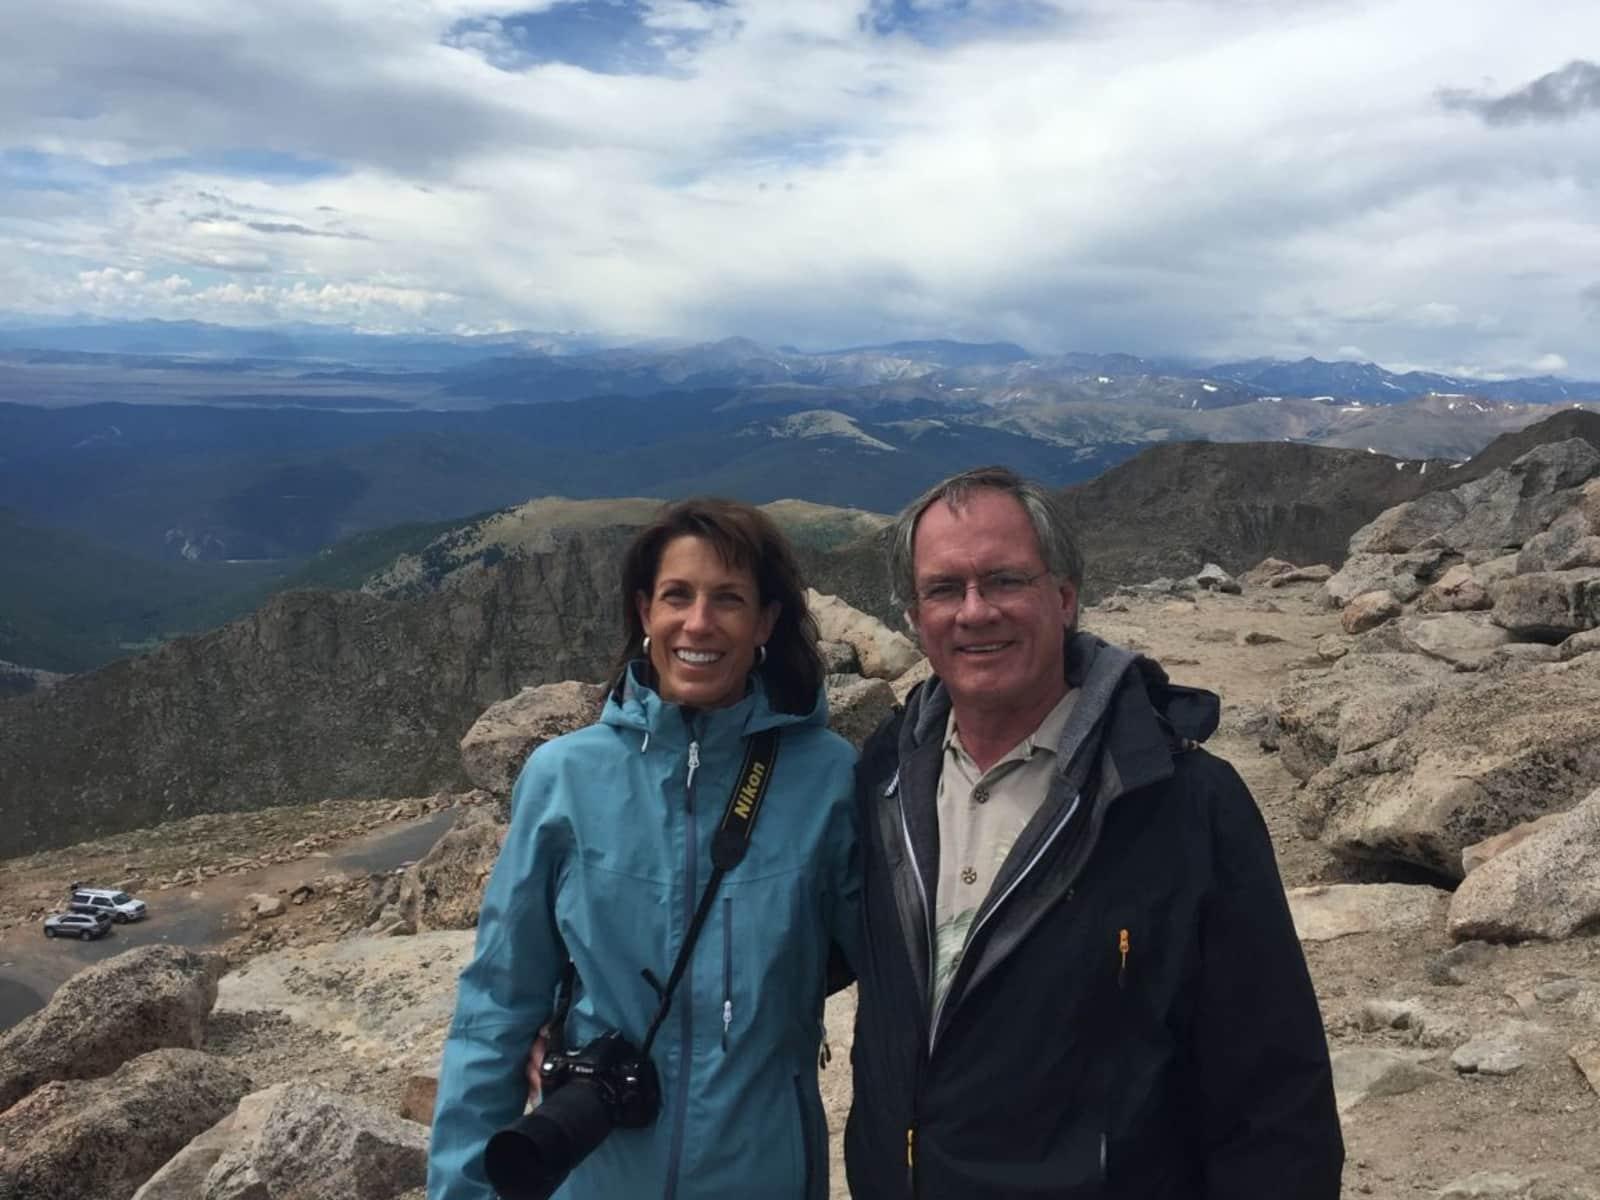 Lori and doug & Doug from Tabernash, Colorado, United States